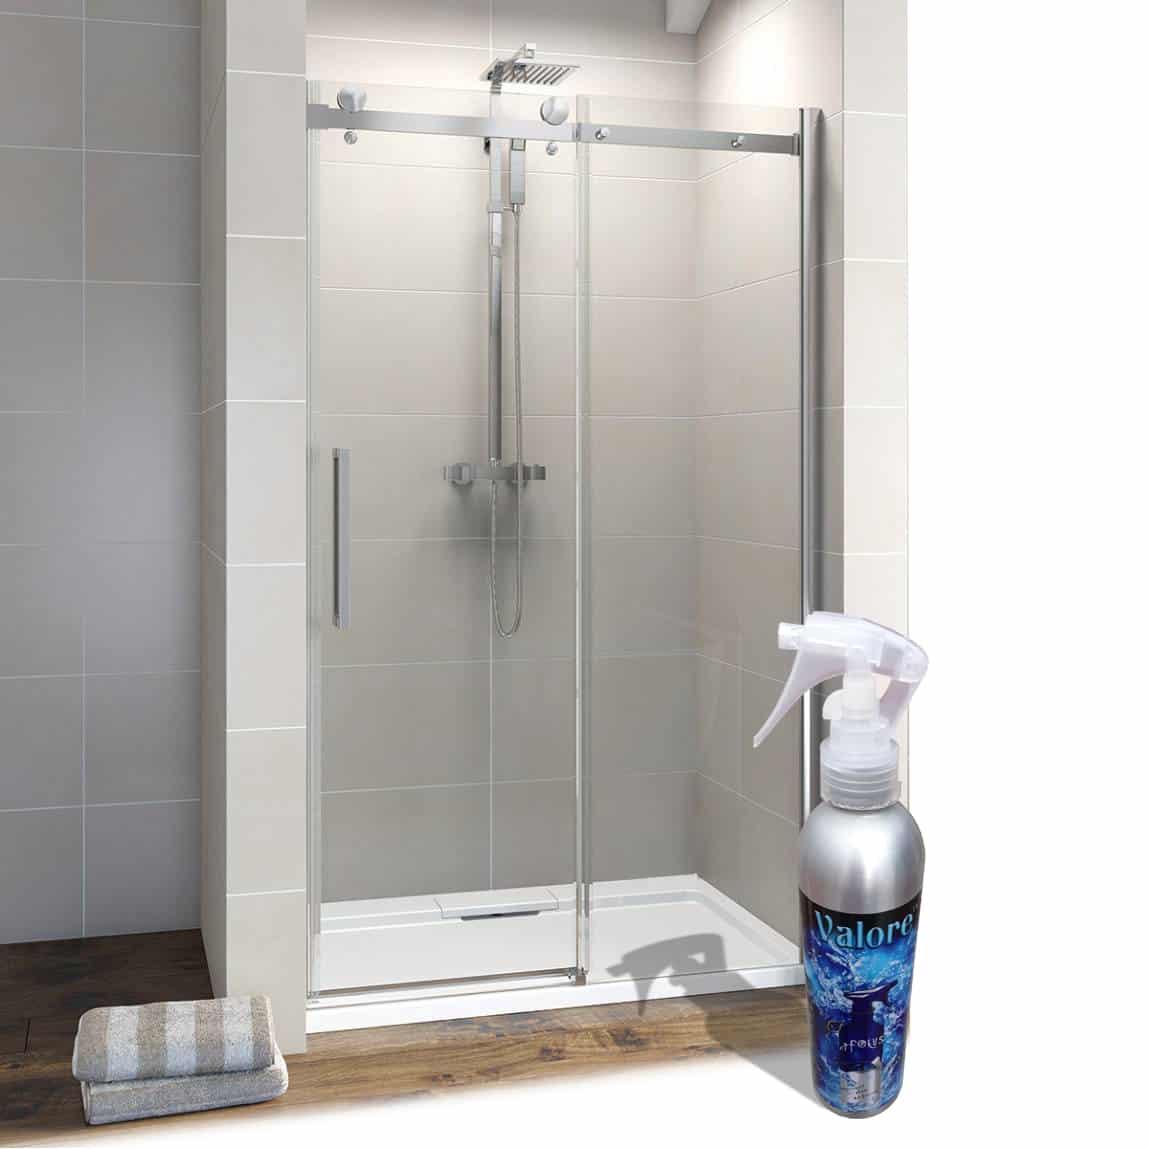 Valore-glass-cleaner-sealer